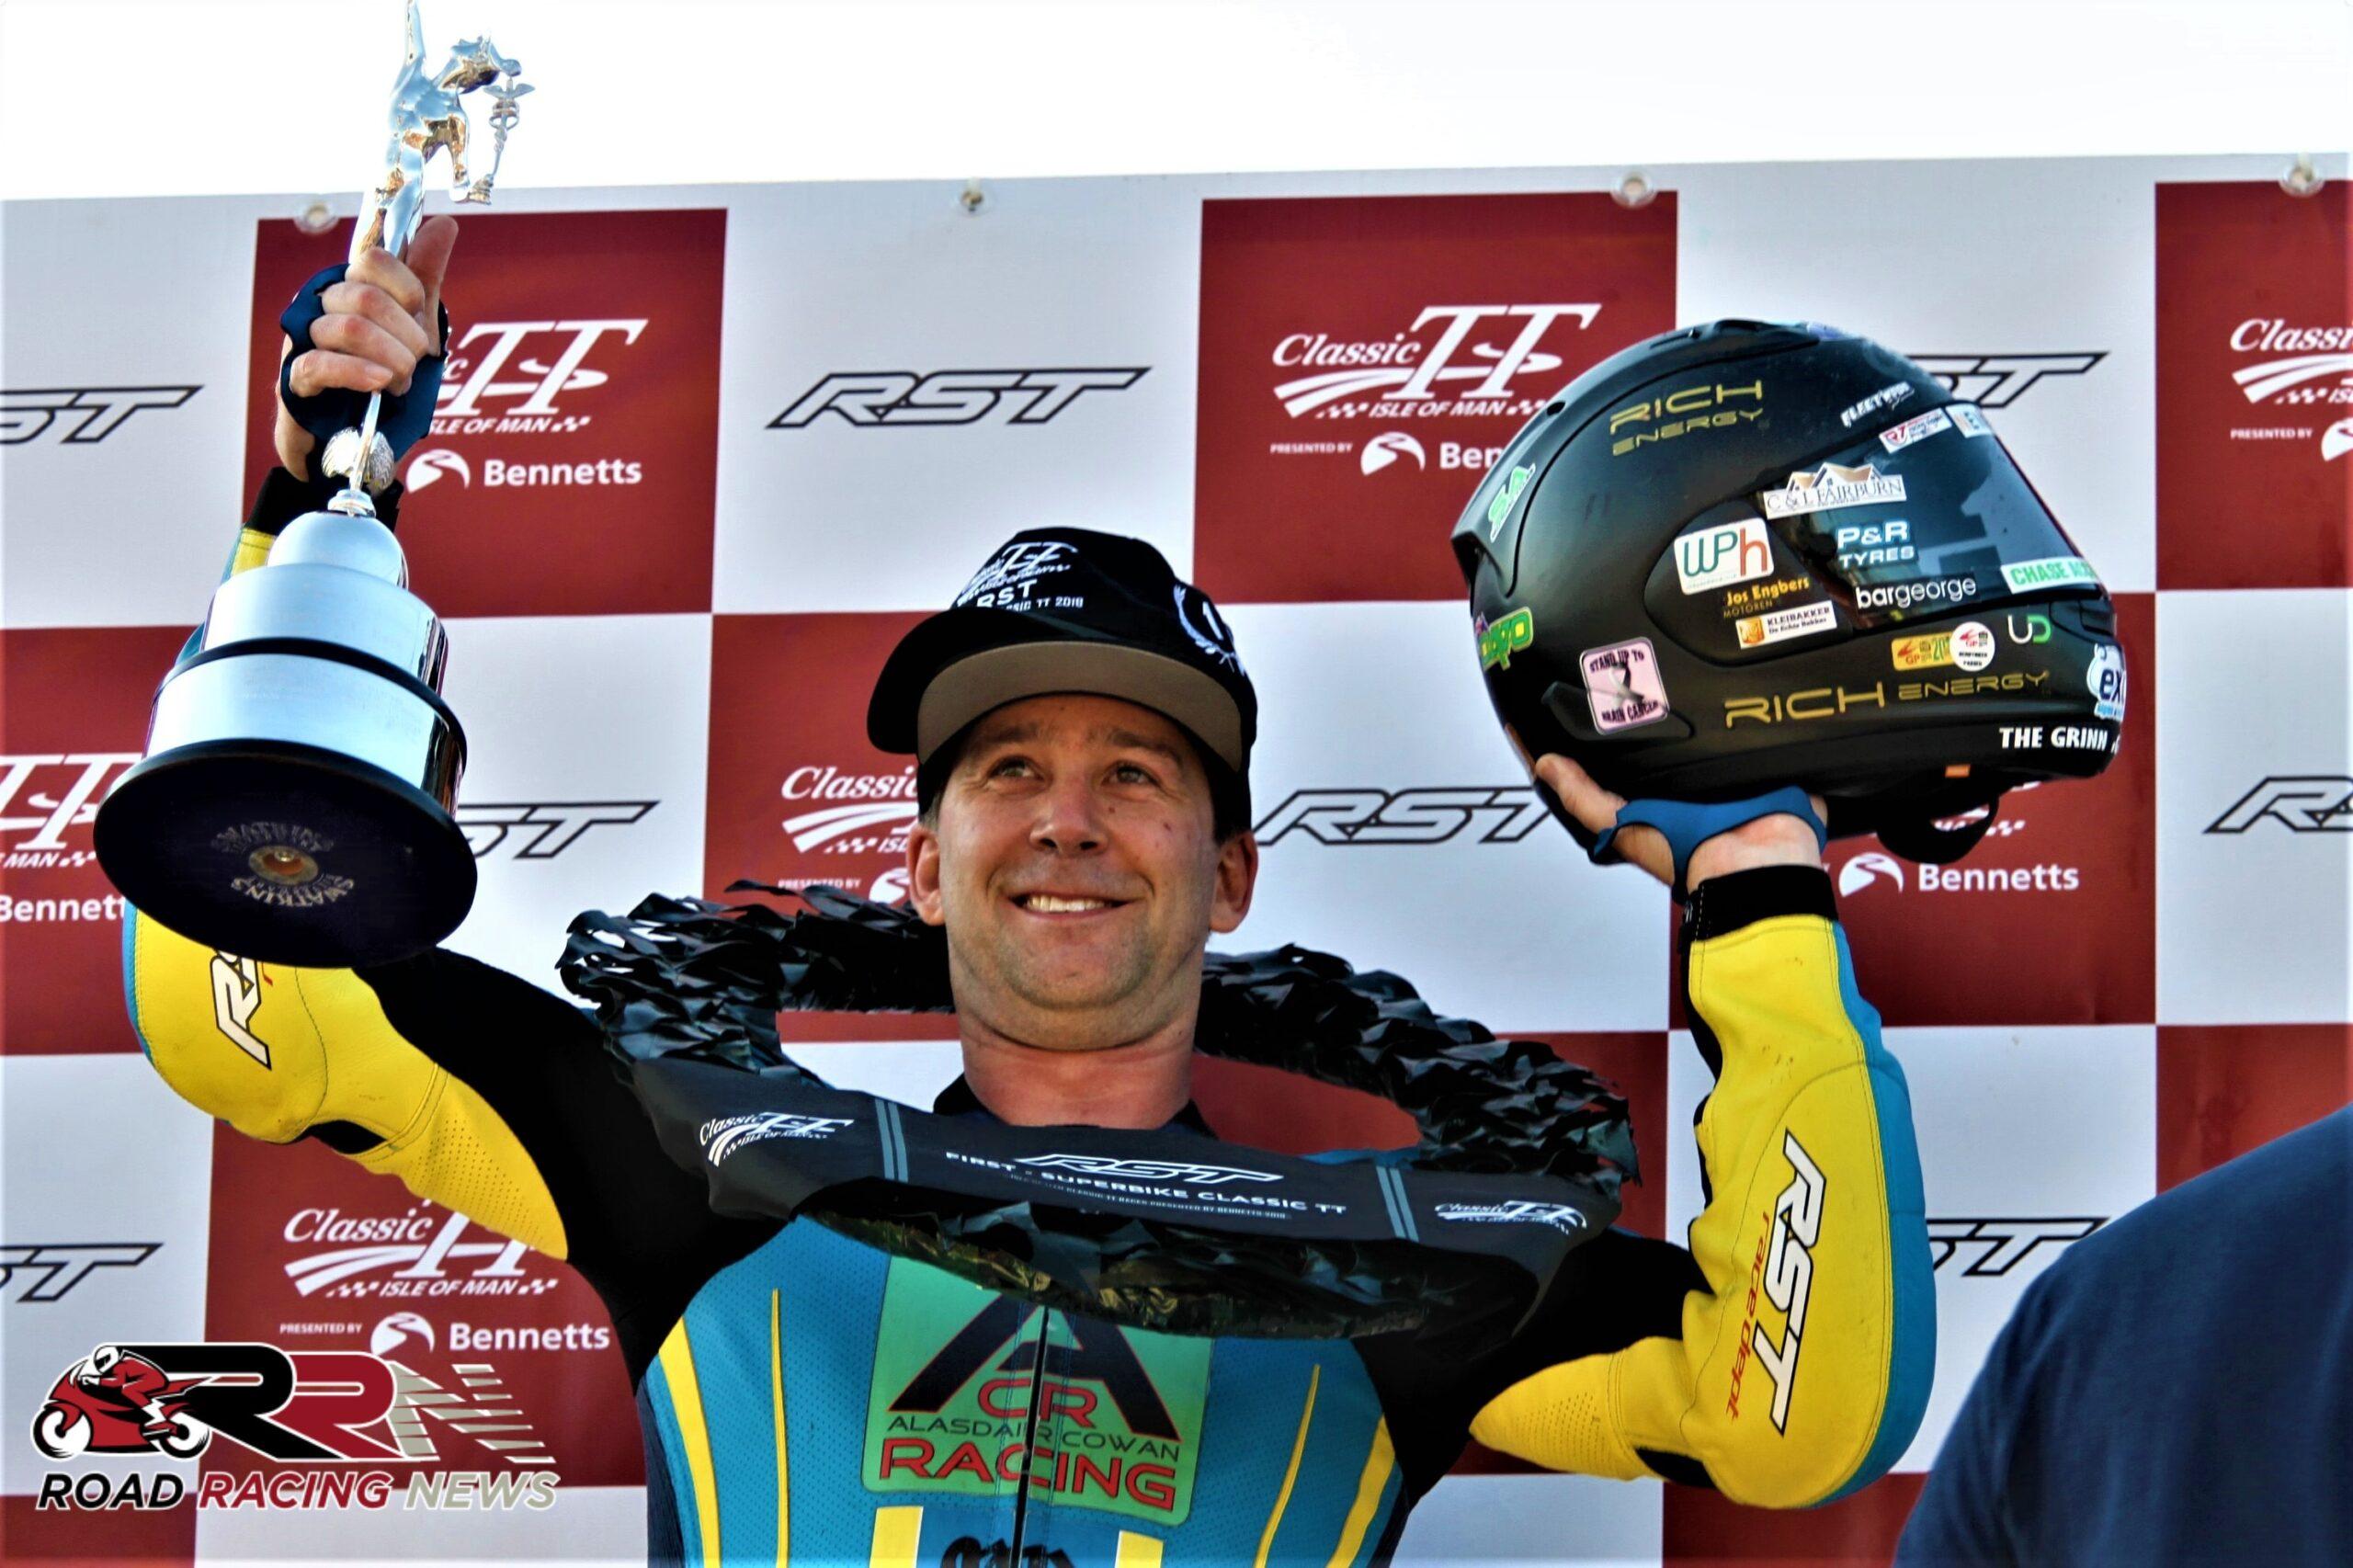 Classic TT: Johnson Wins Attritional, Drama Filled RST Superbike Race